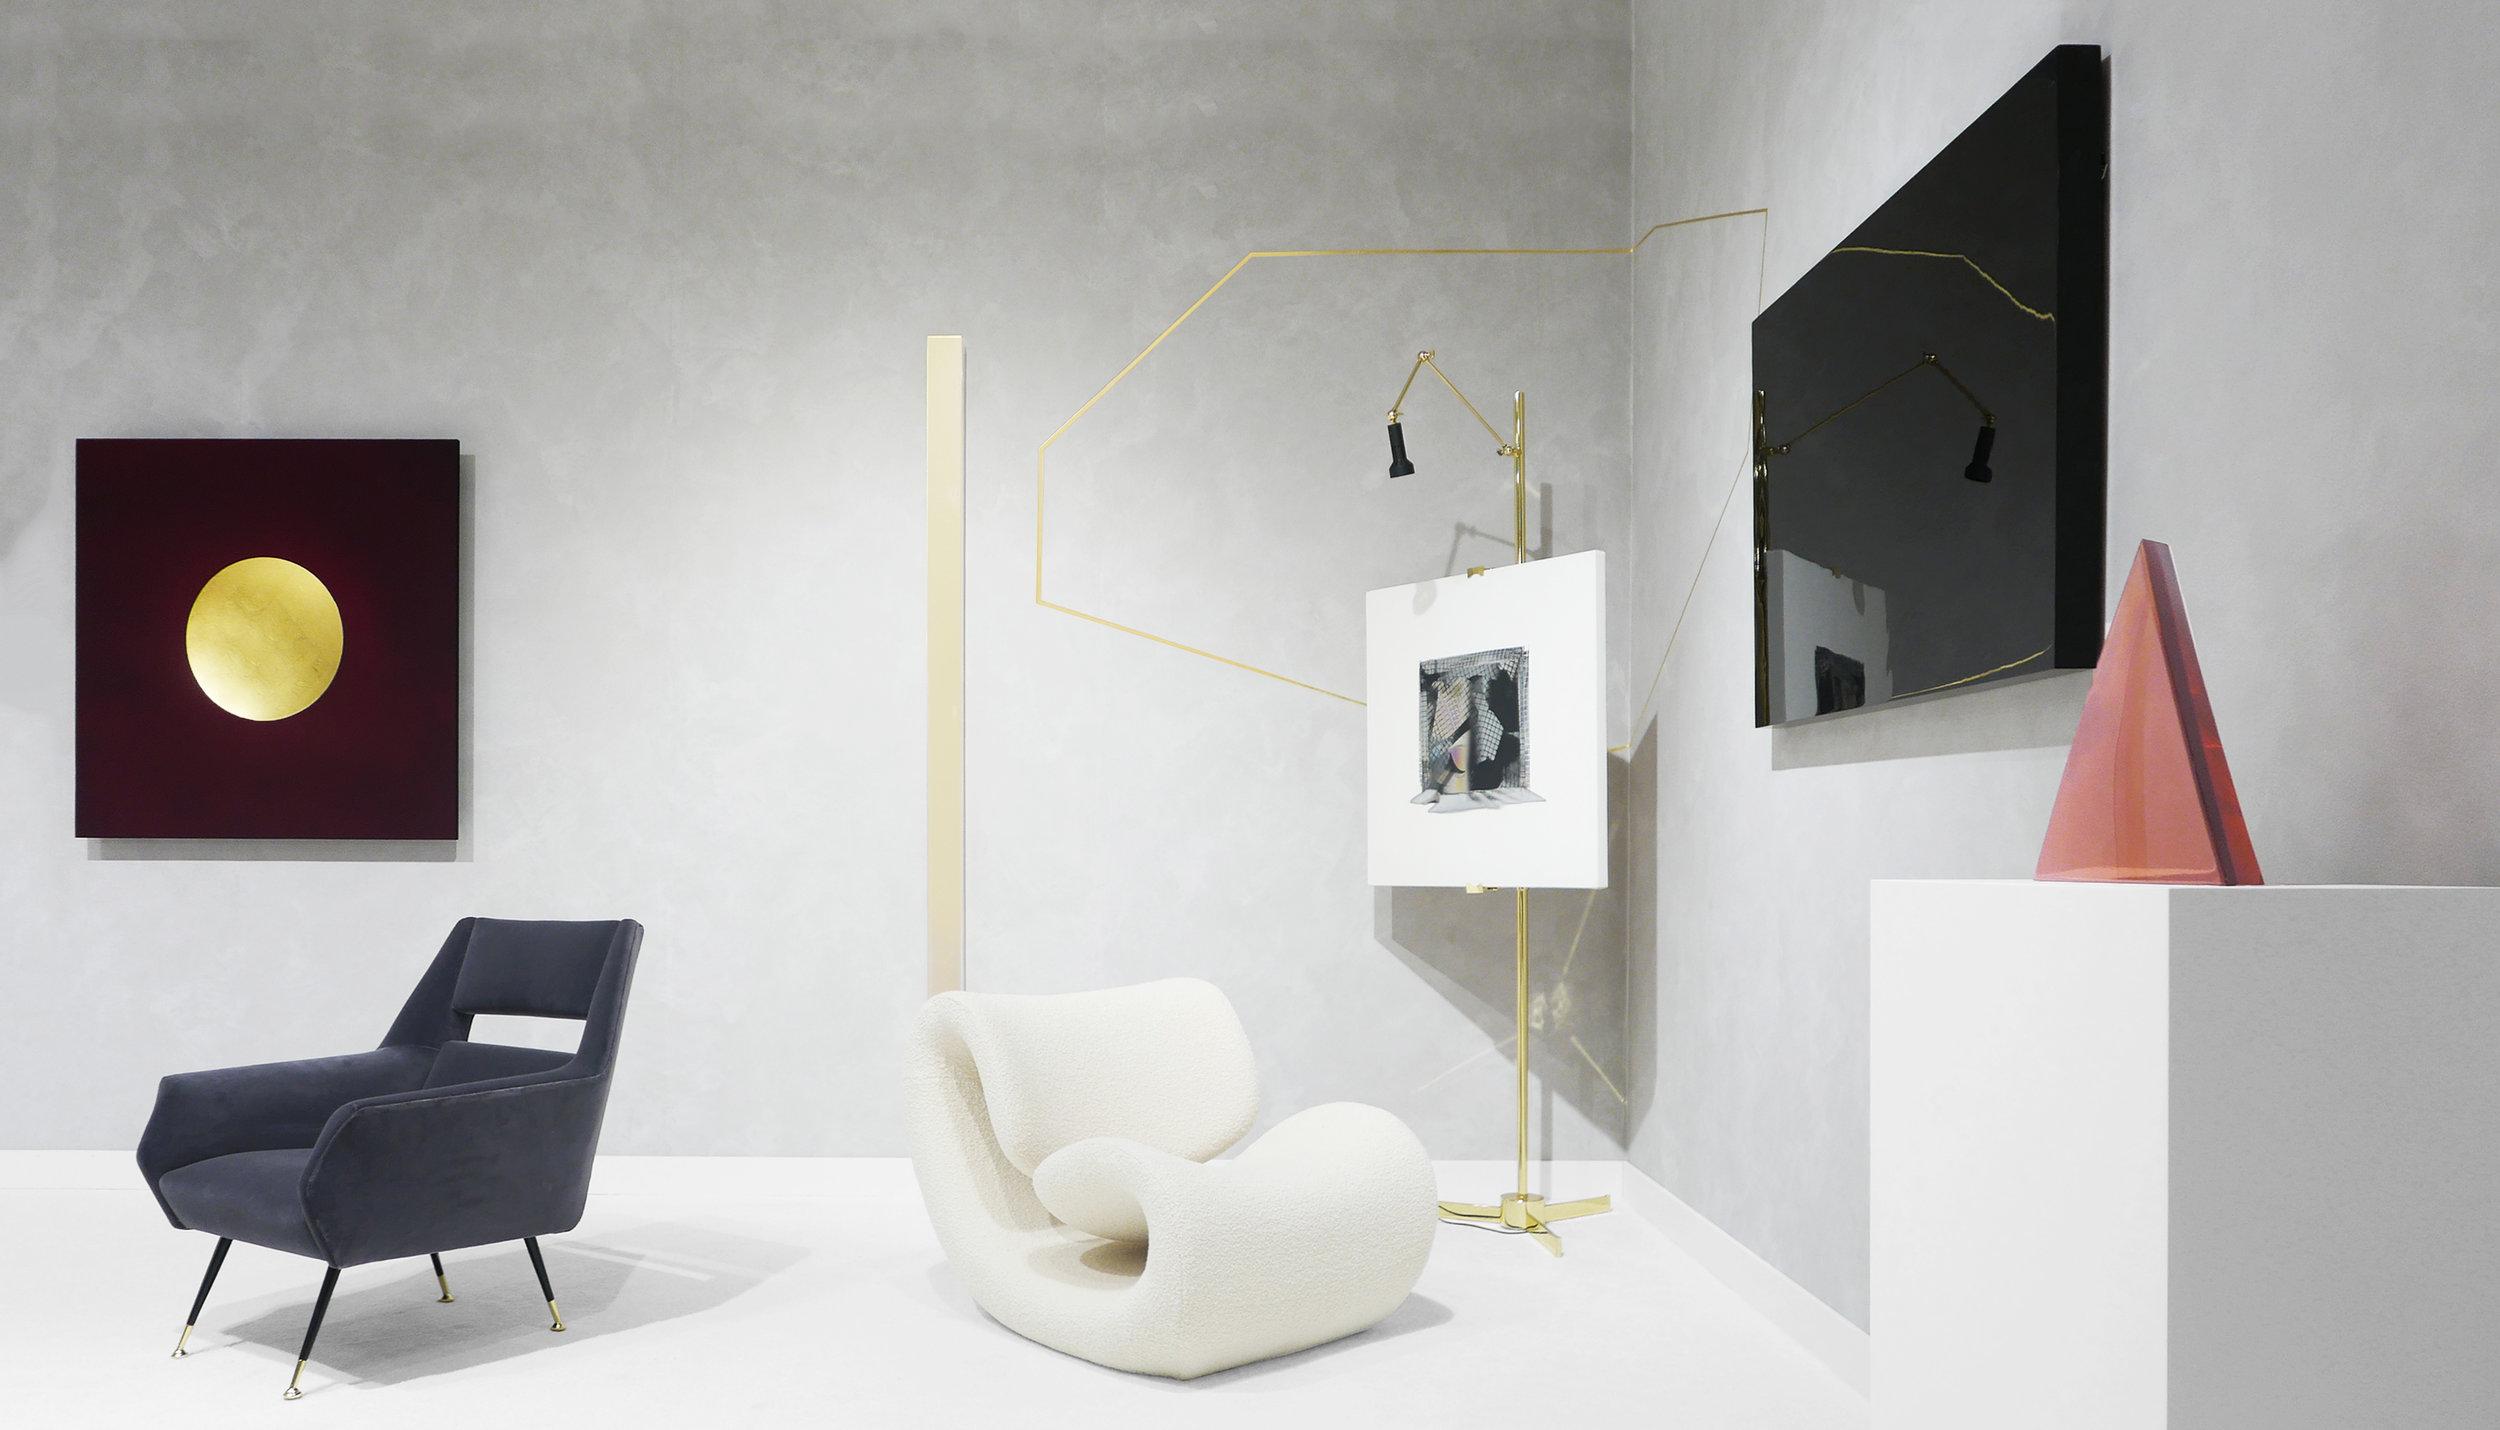 Collective Design New York 2018_Peter Blake Gallery_Installation View_17.jpg